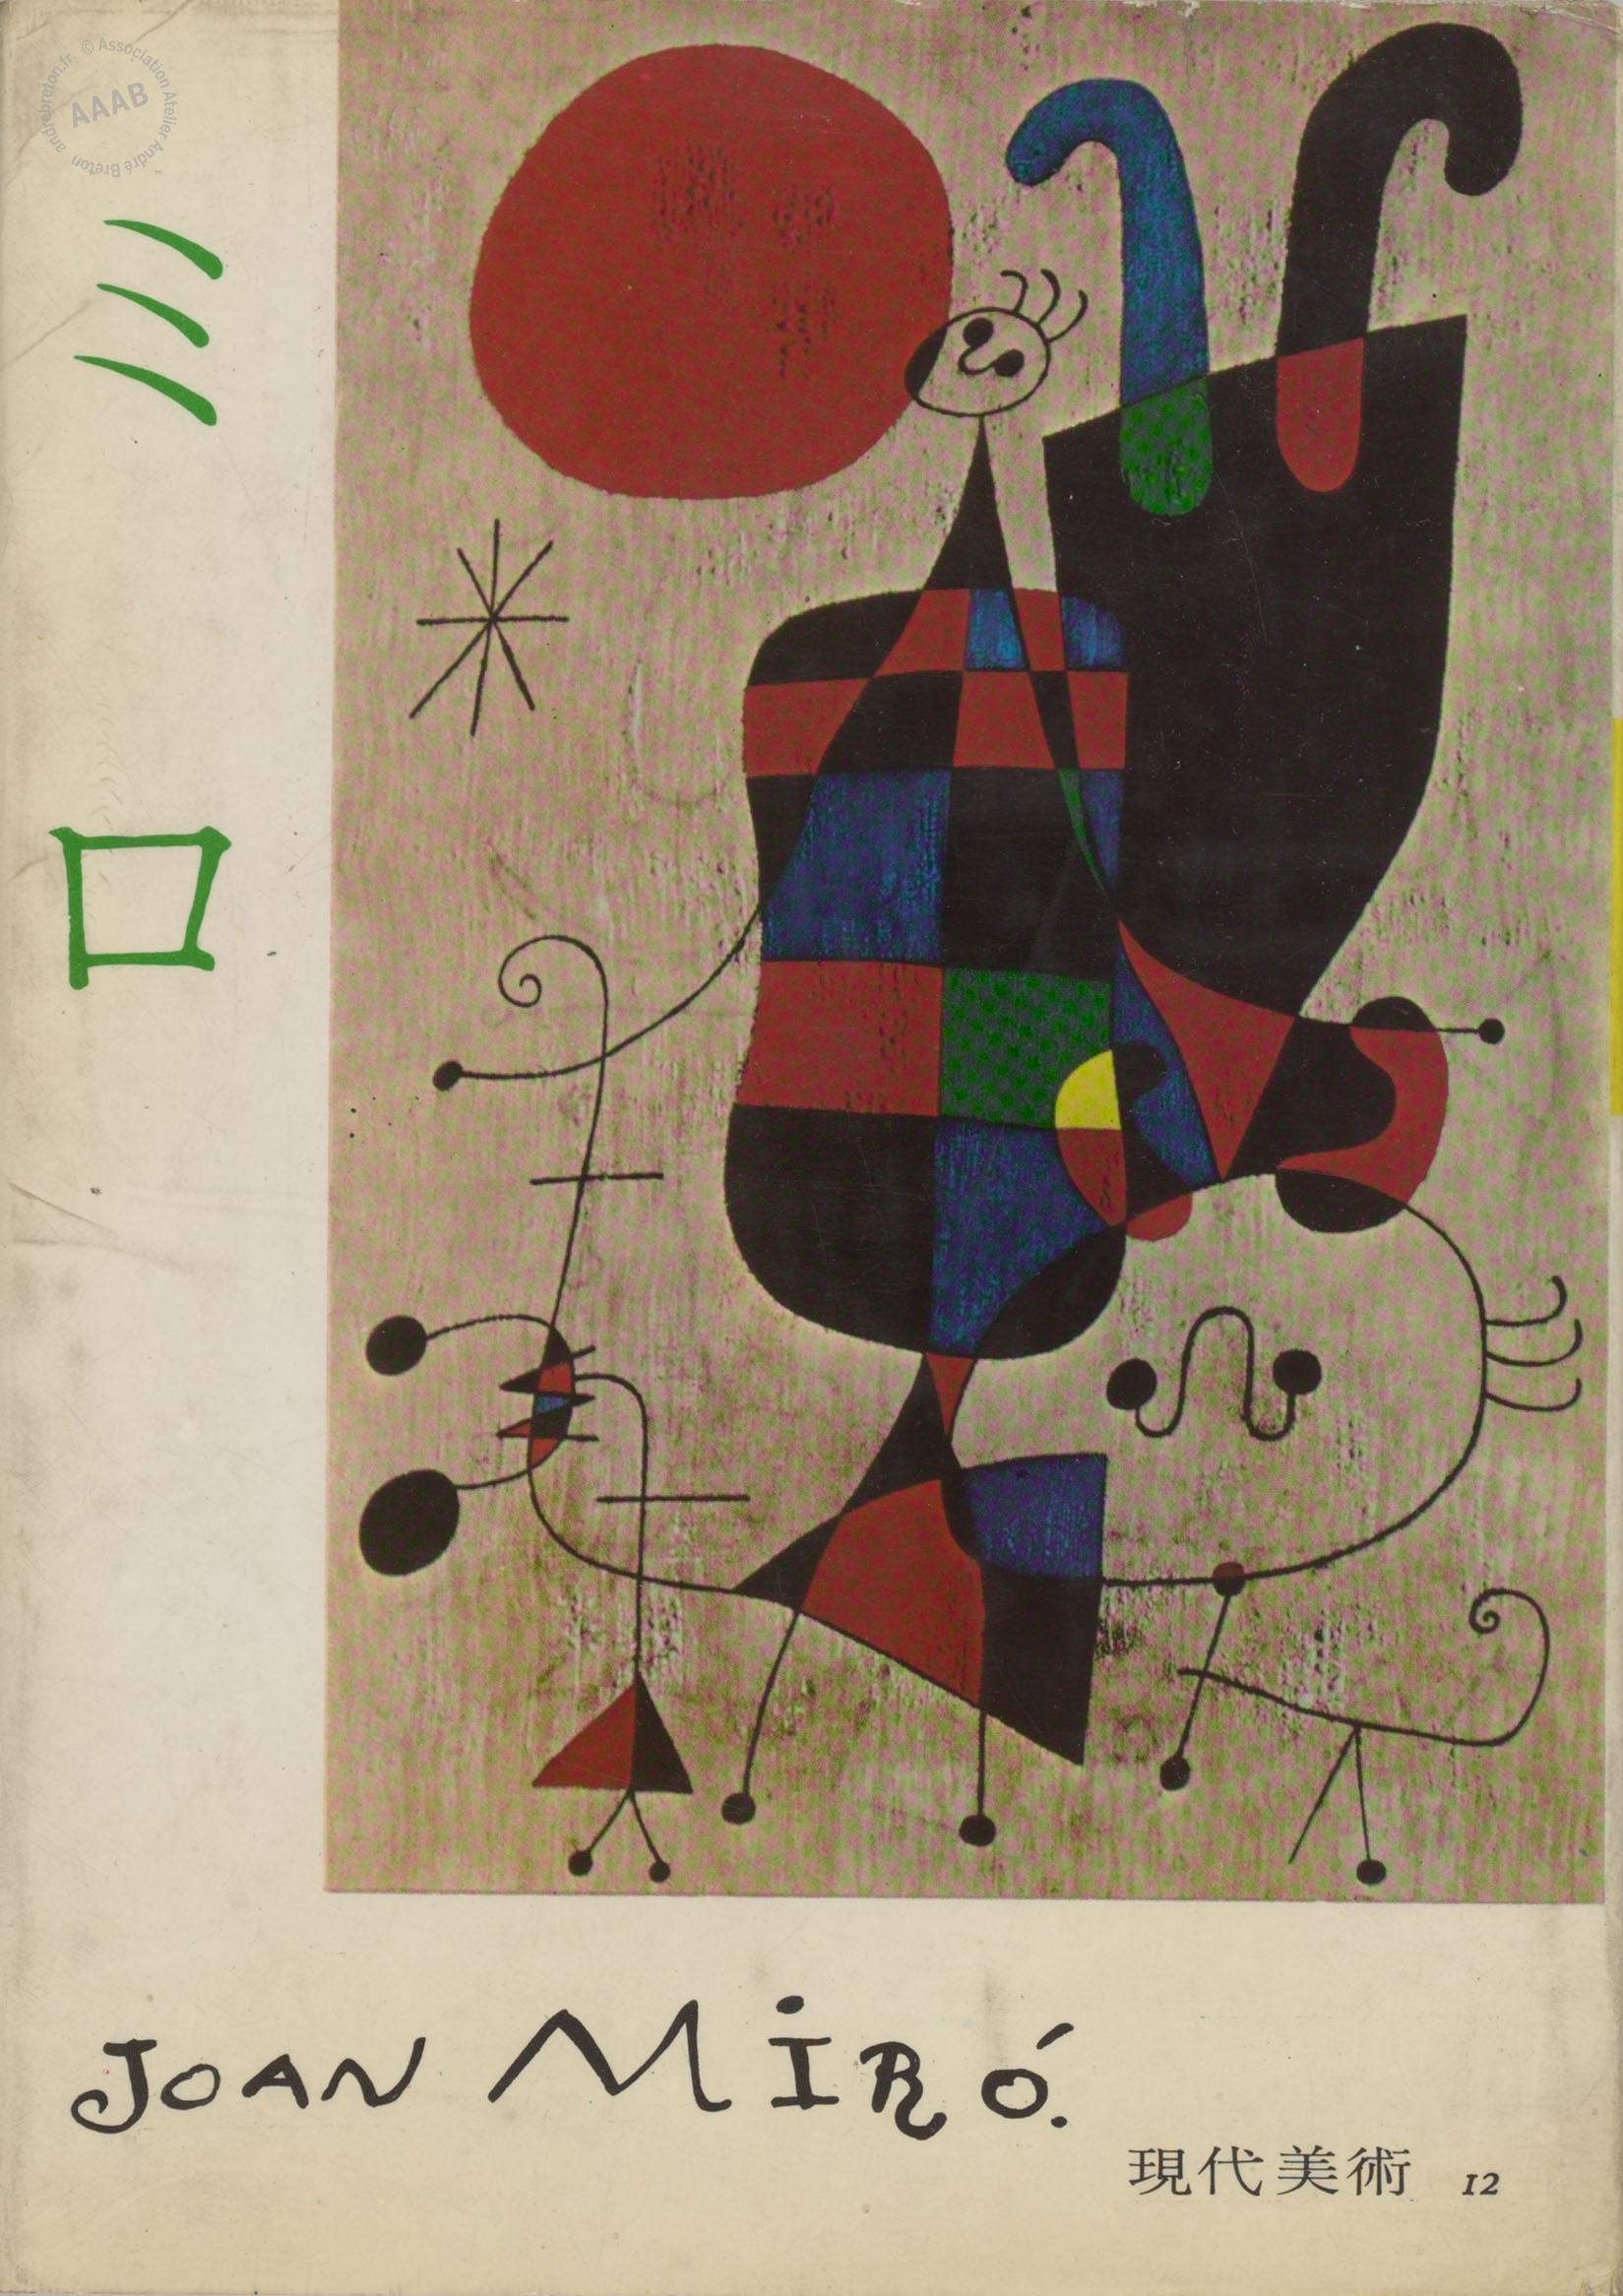 Joan Miro Andre Breton